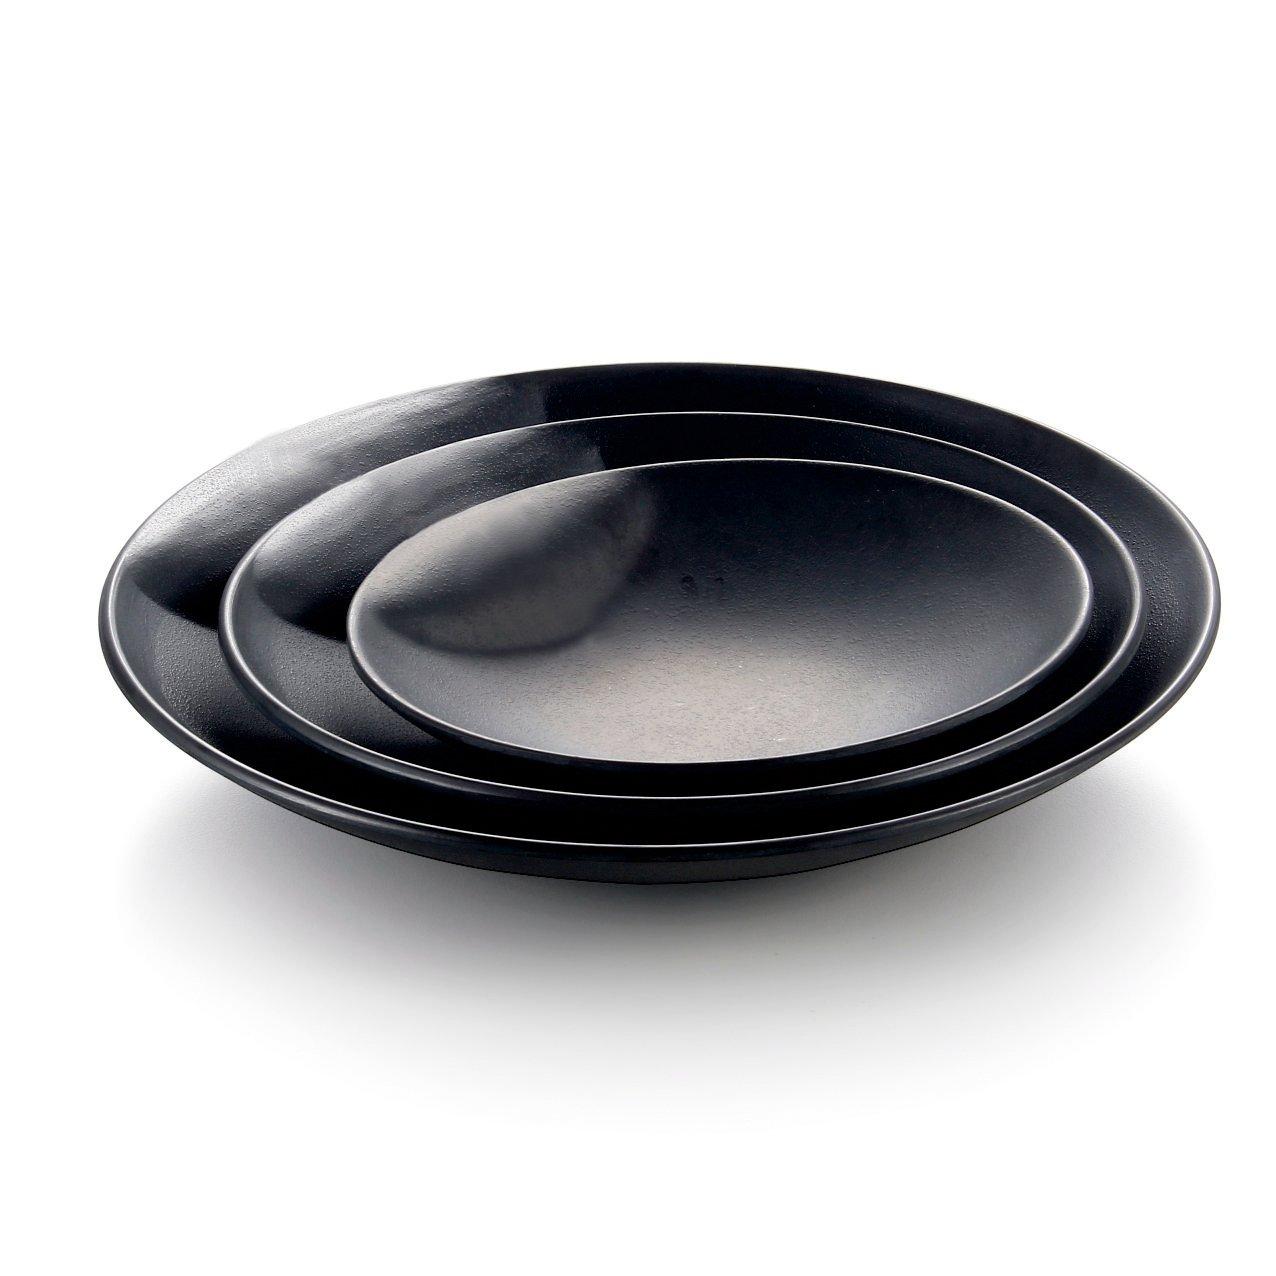 Kinglang 4-6'' Melamine Plastic Japan and South Korea Style Sauce Dish A7906